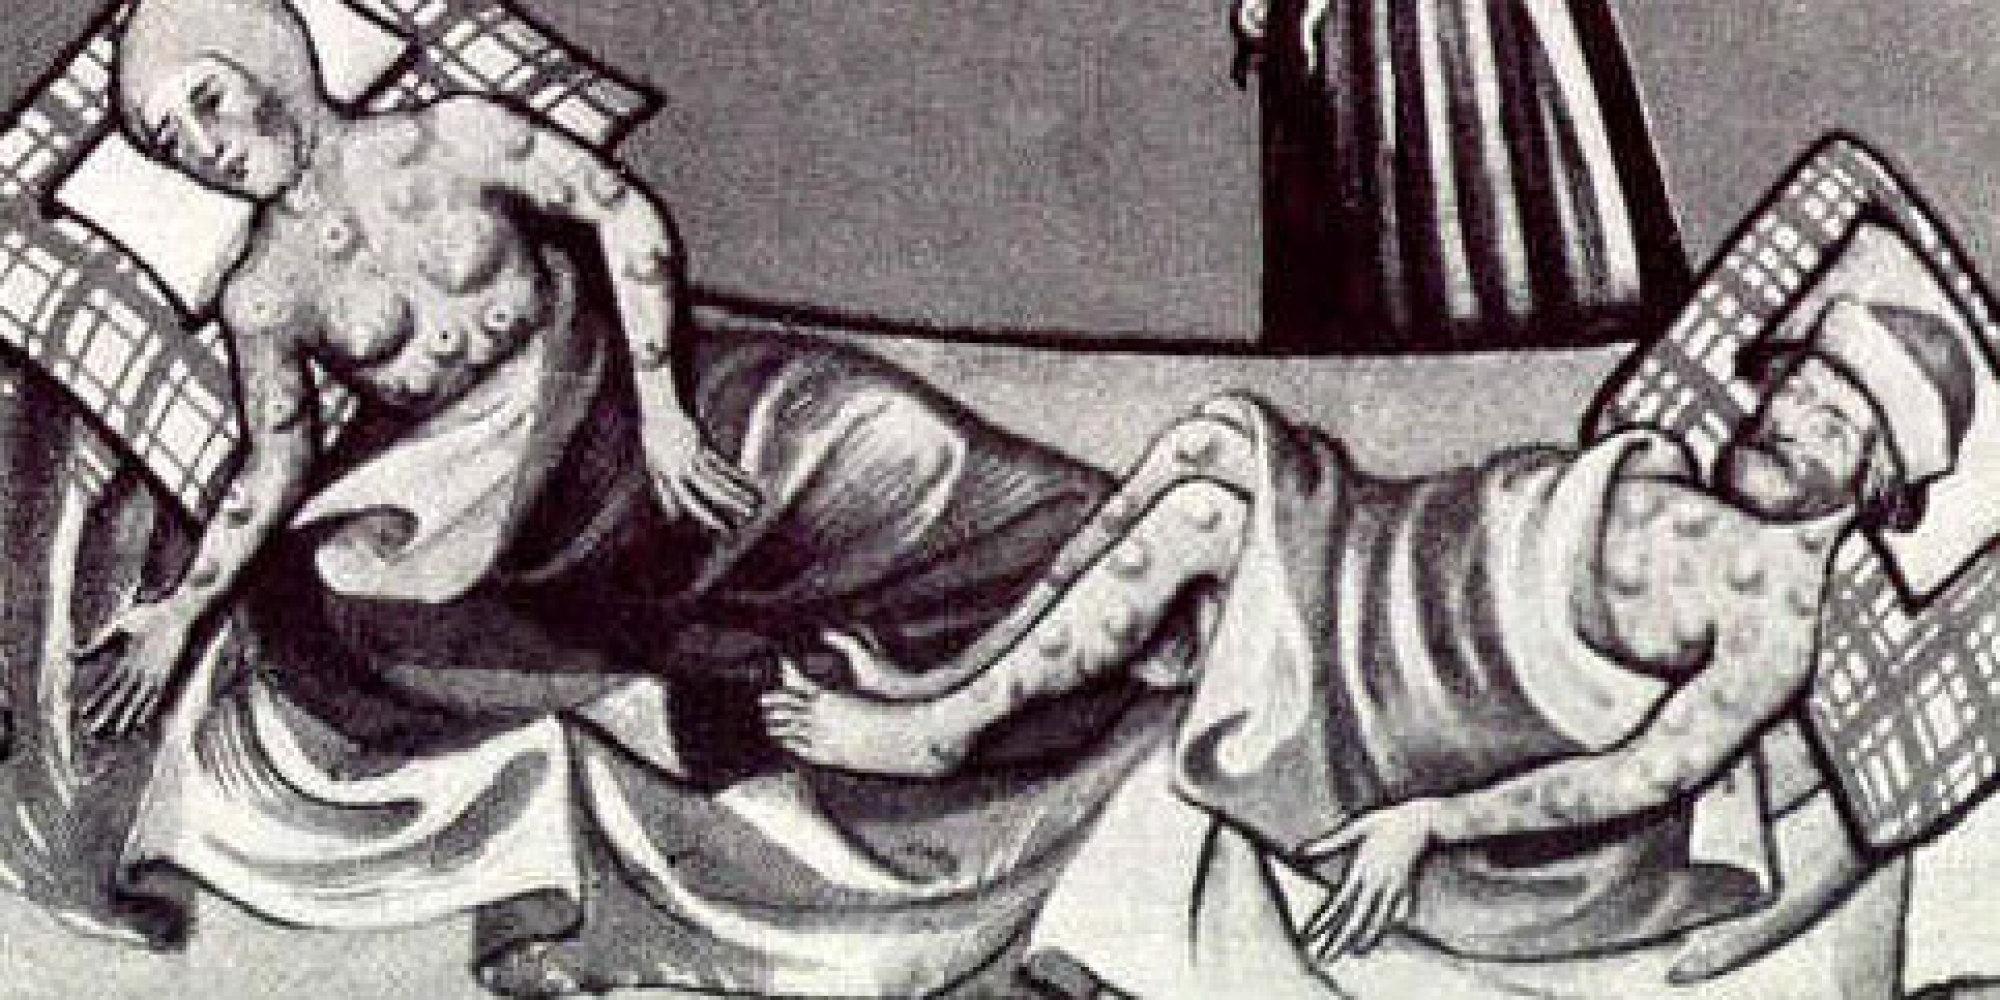 Images of Black Death | 2000x1000